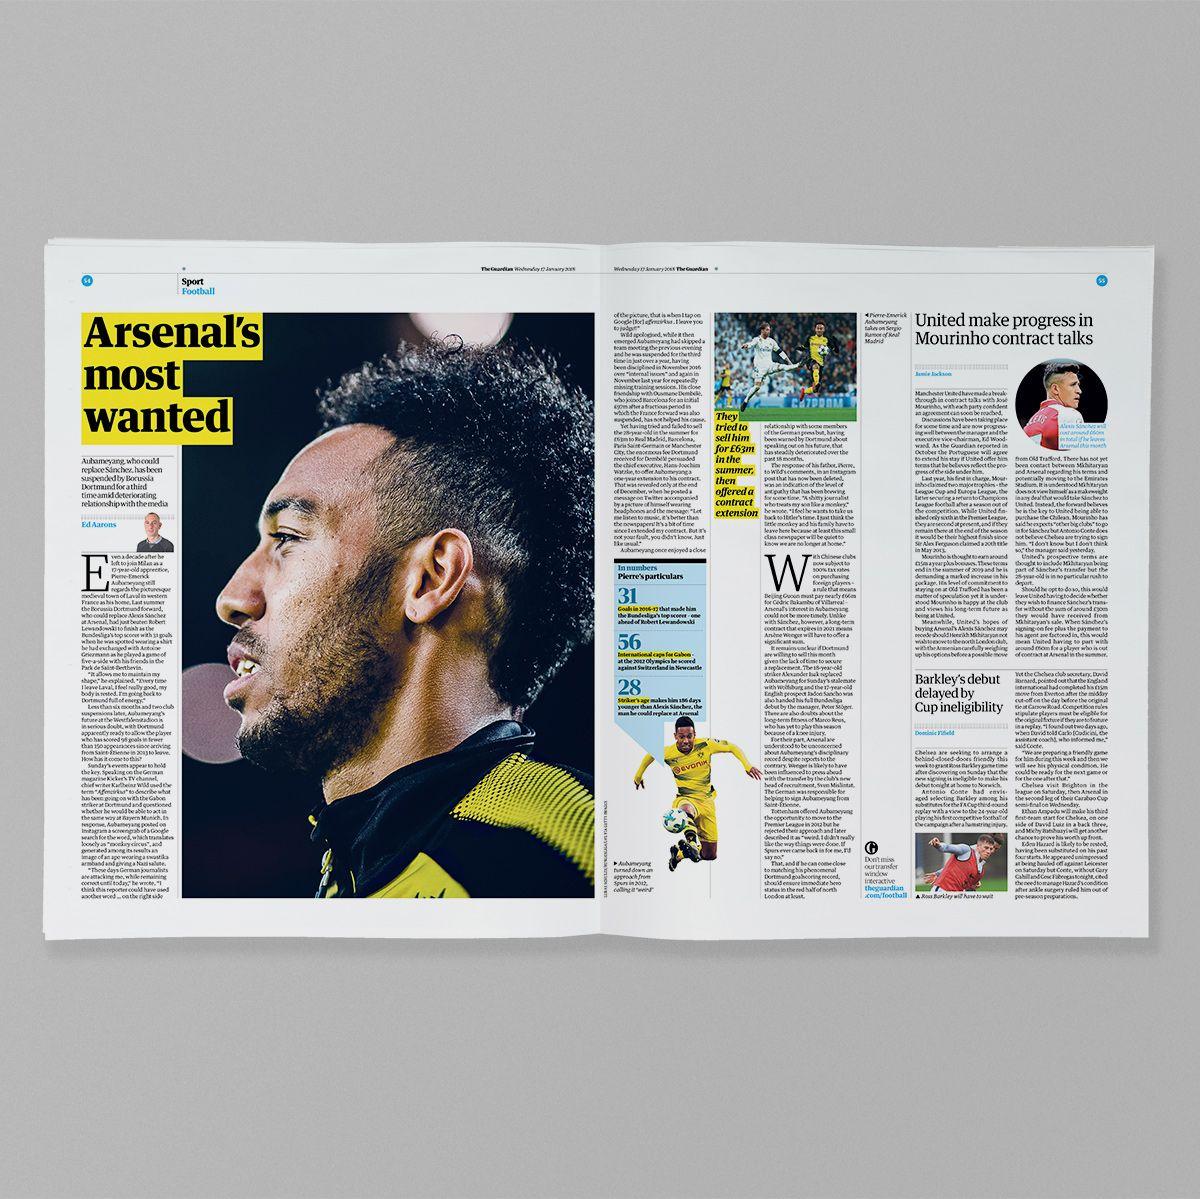 Guardian Sport #editorialdesign #newsdesign #graphicdesign #sportsdesign